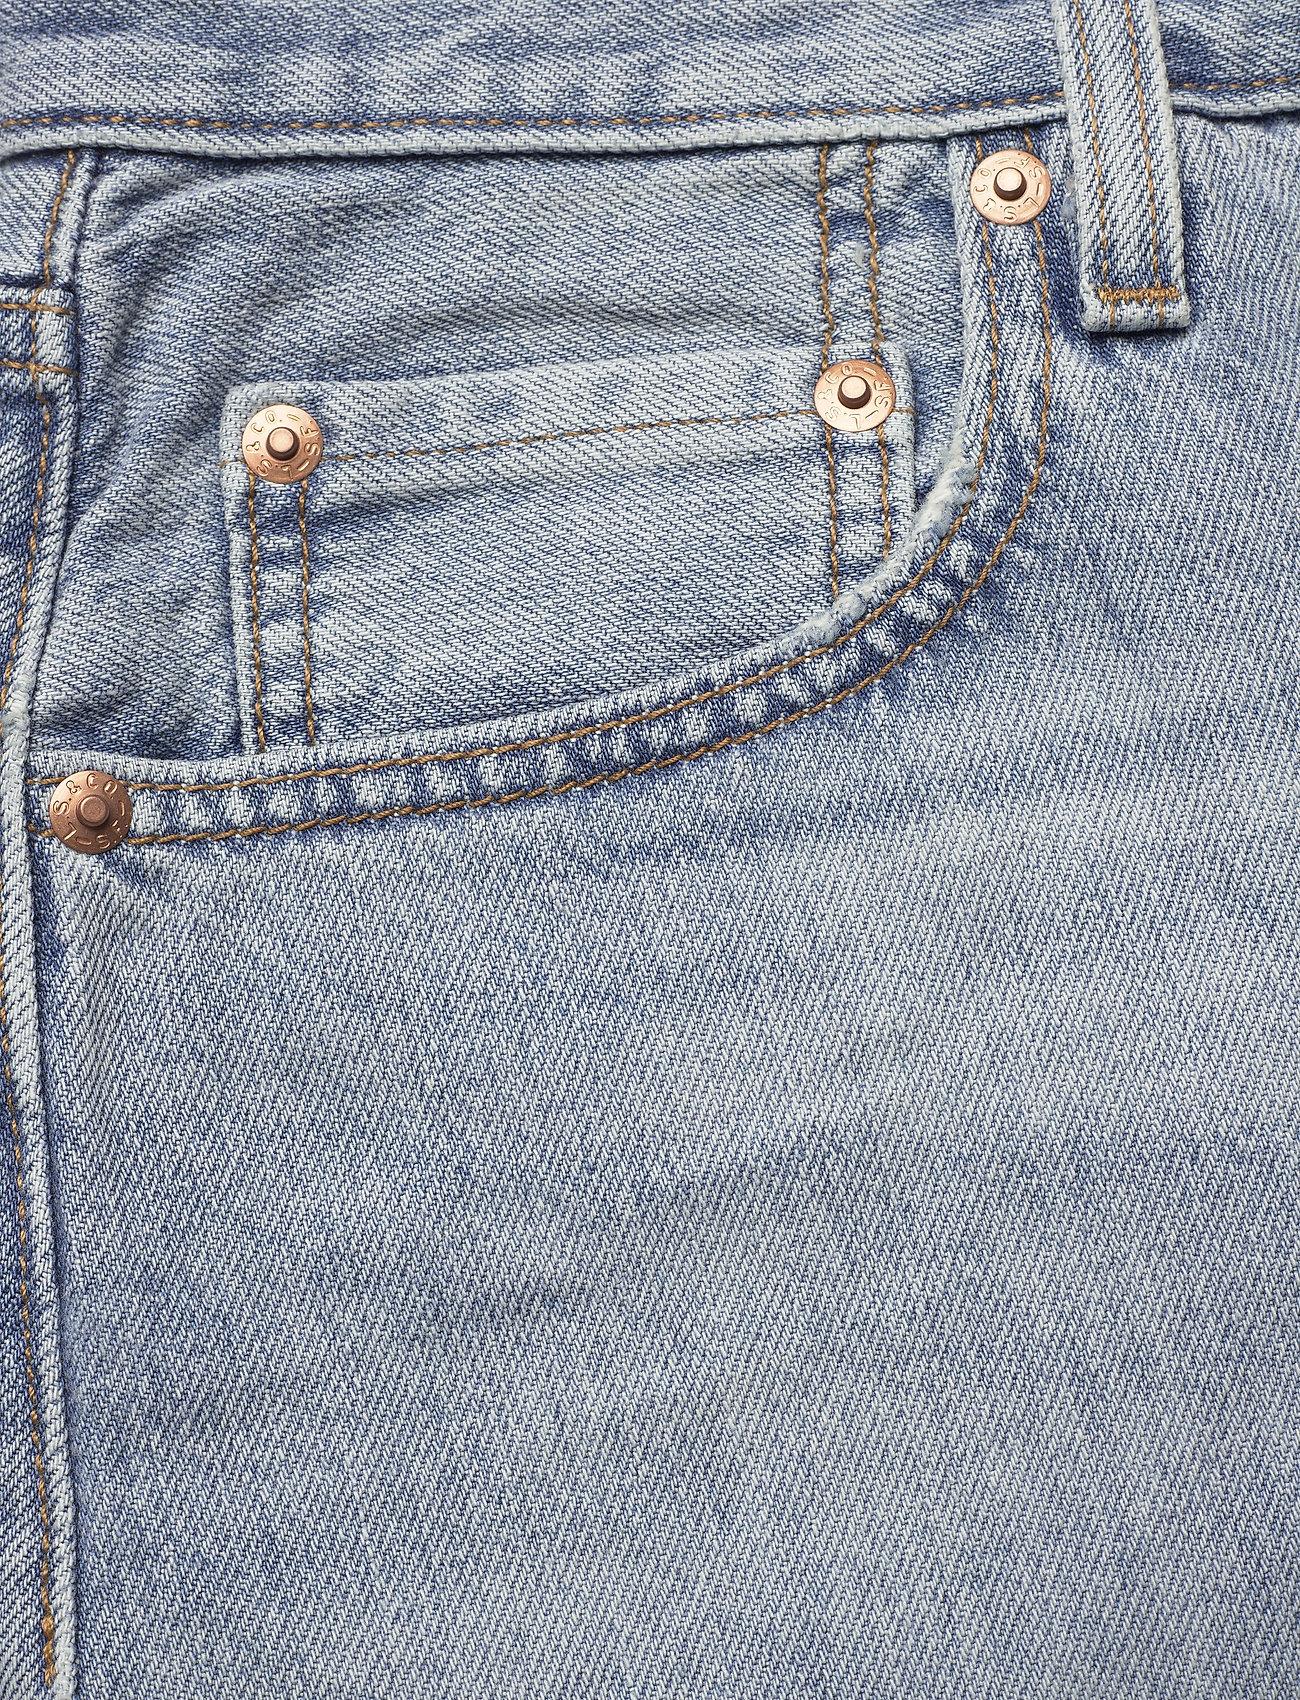 Button Front Midi Skirt Blue C (Med Indigo - Worn In) (51 €) - LEVI´S Women Lntnt